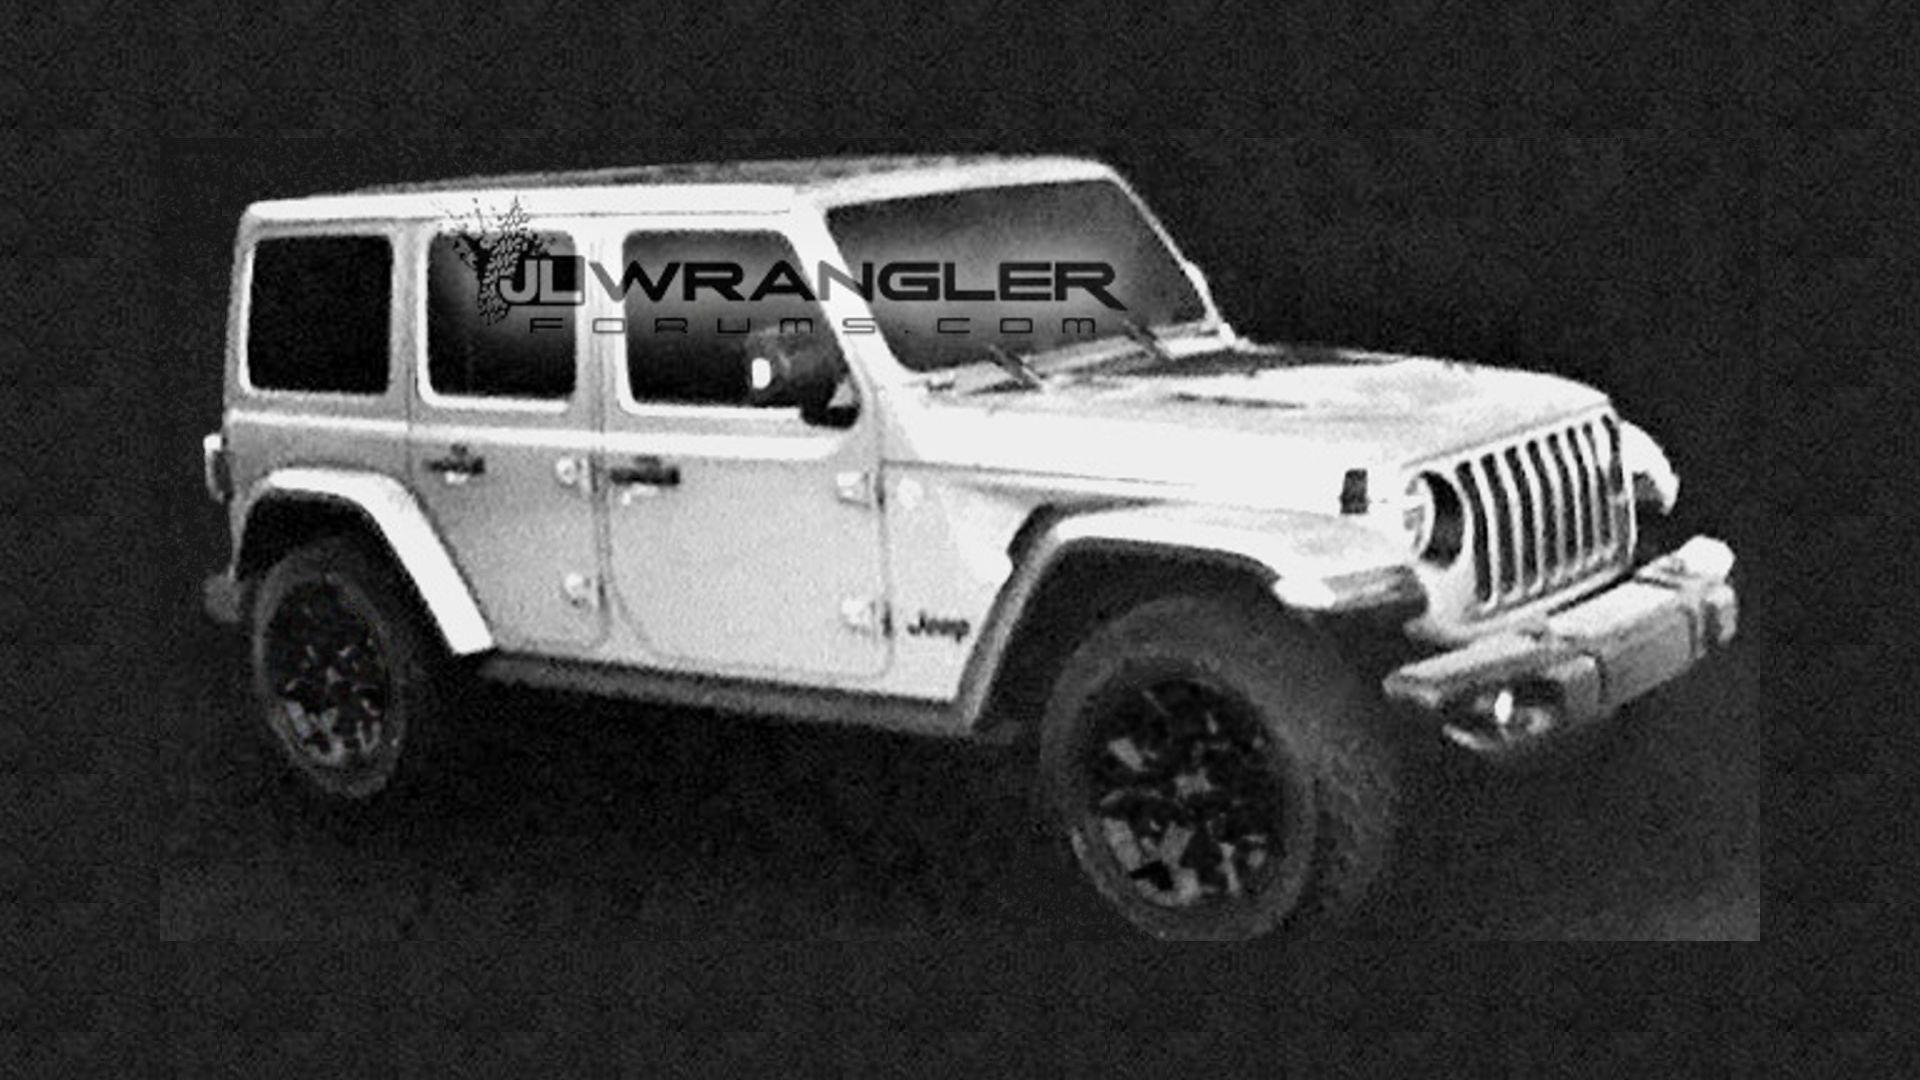 2018 Jeep Wrangler Unlimited Images Leak Showing Removable ...